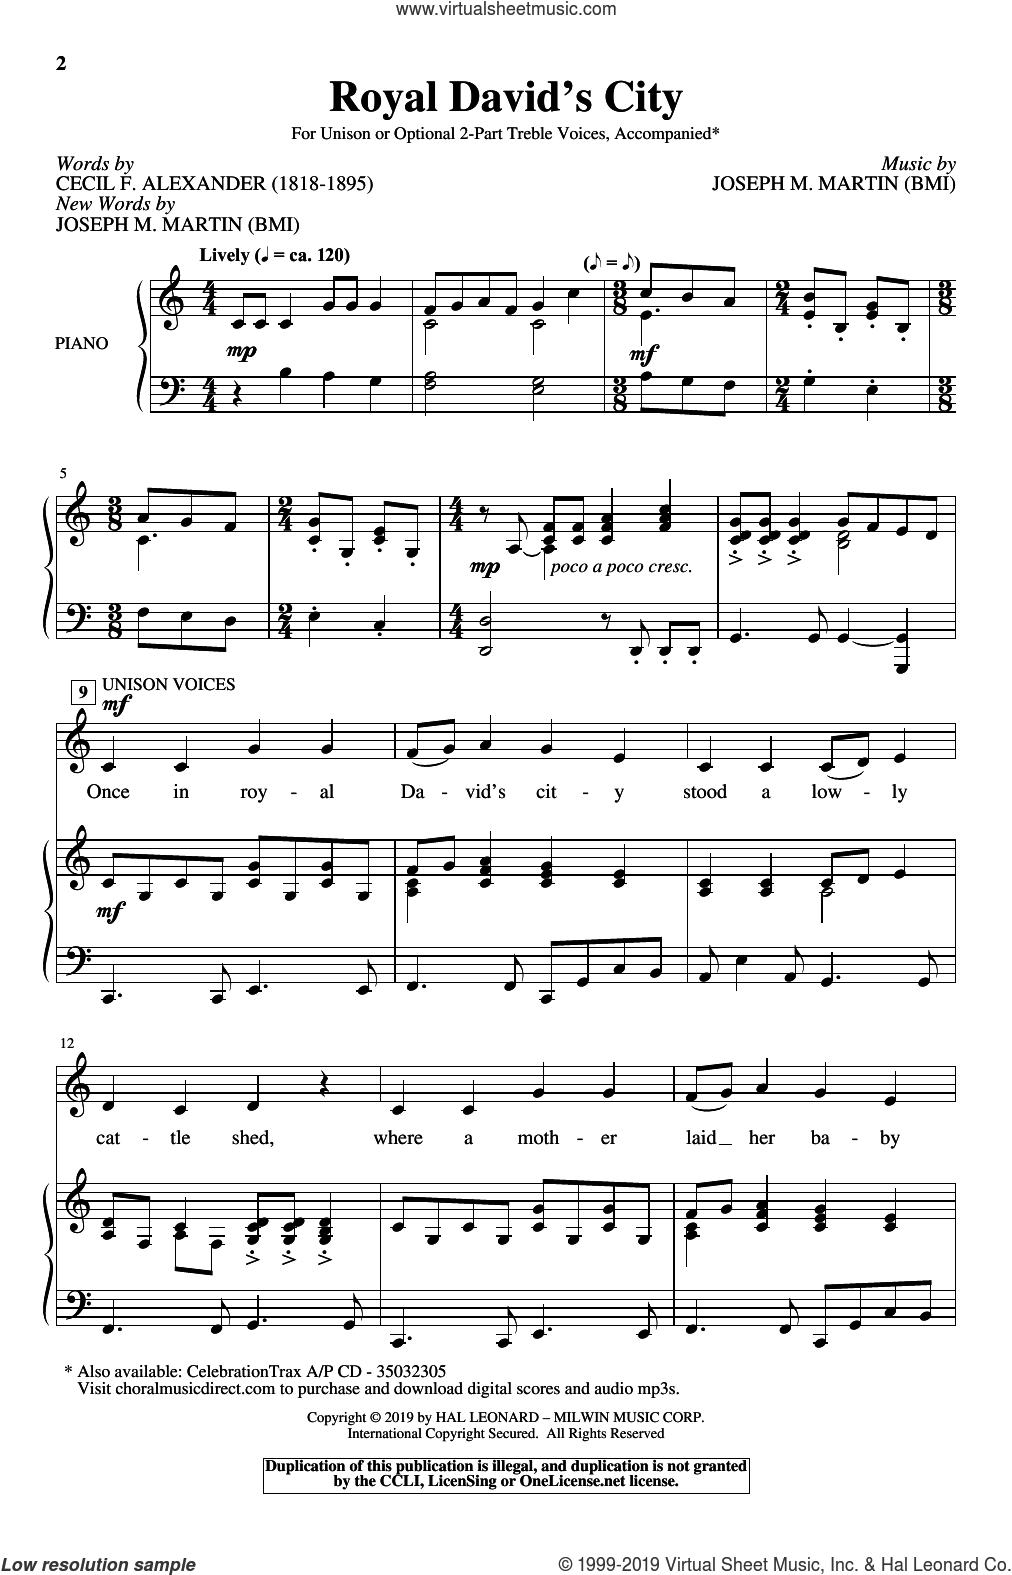 Royal David's City sheet music for choir (Unison/Optional 2-Part) by Joseph M. Martin and Cecil Alexander, intermediate skill level